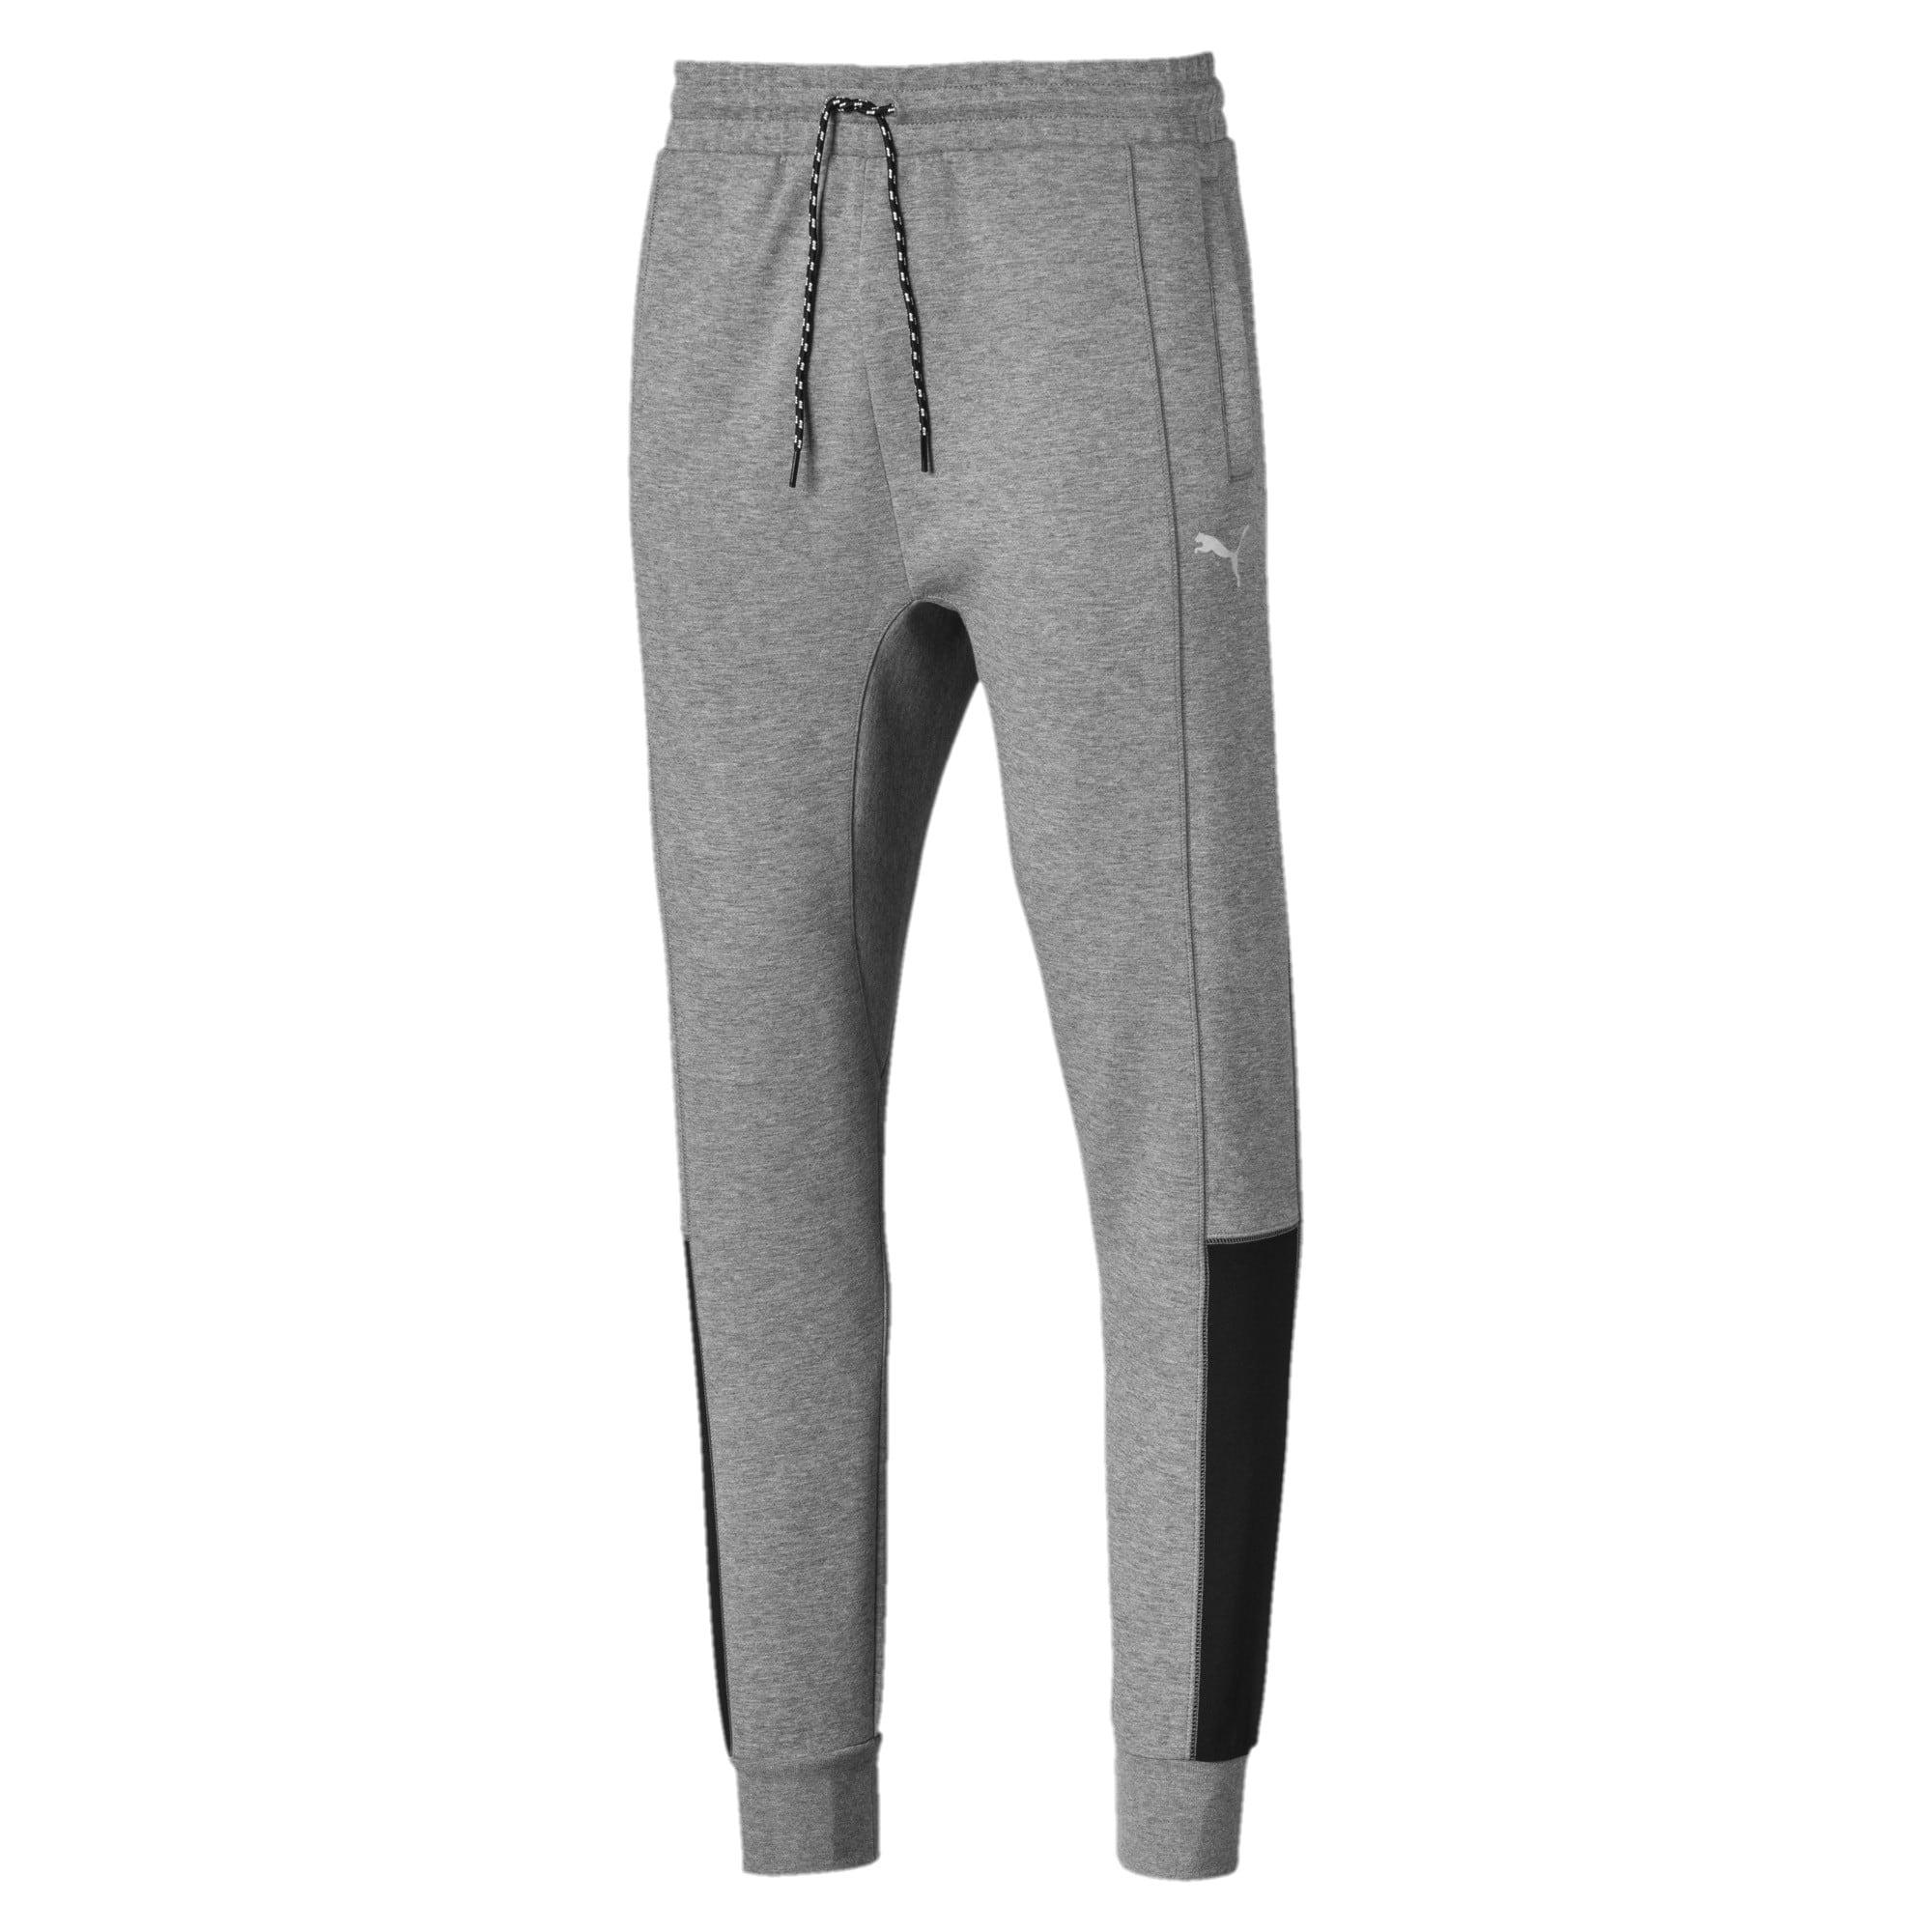 Thumbnail 1 of Epoch Knitted broek voor heren, Medium Gray Heather, medium